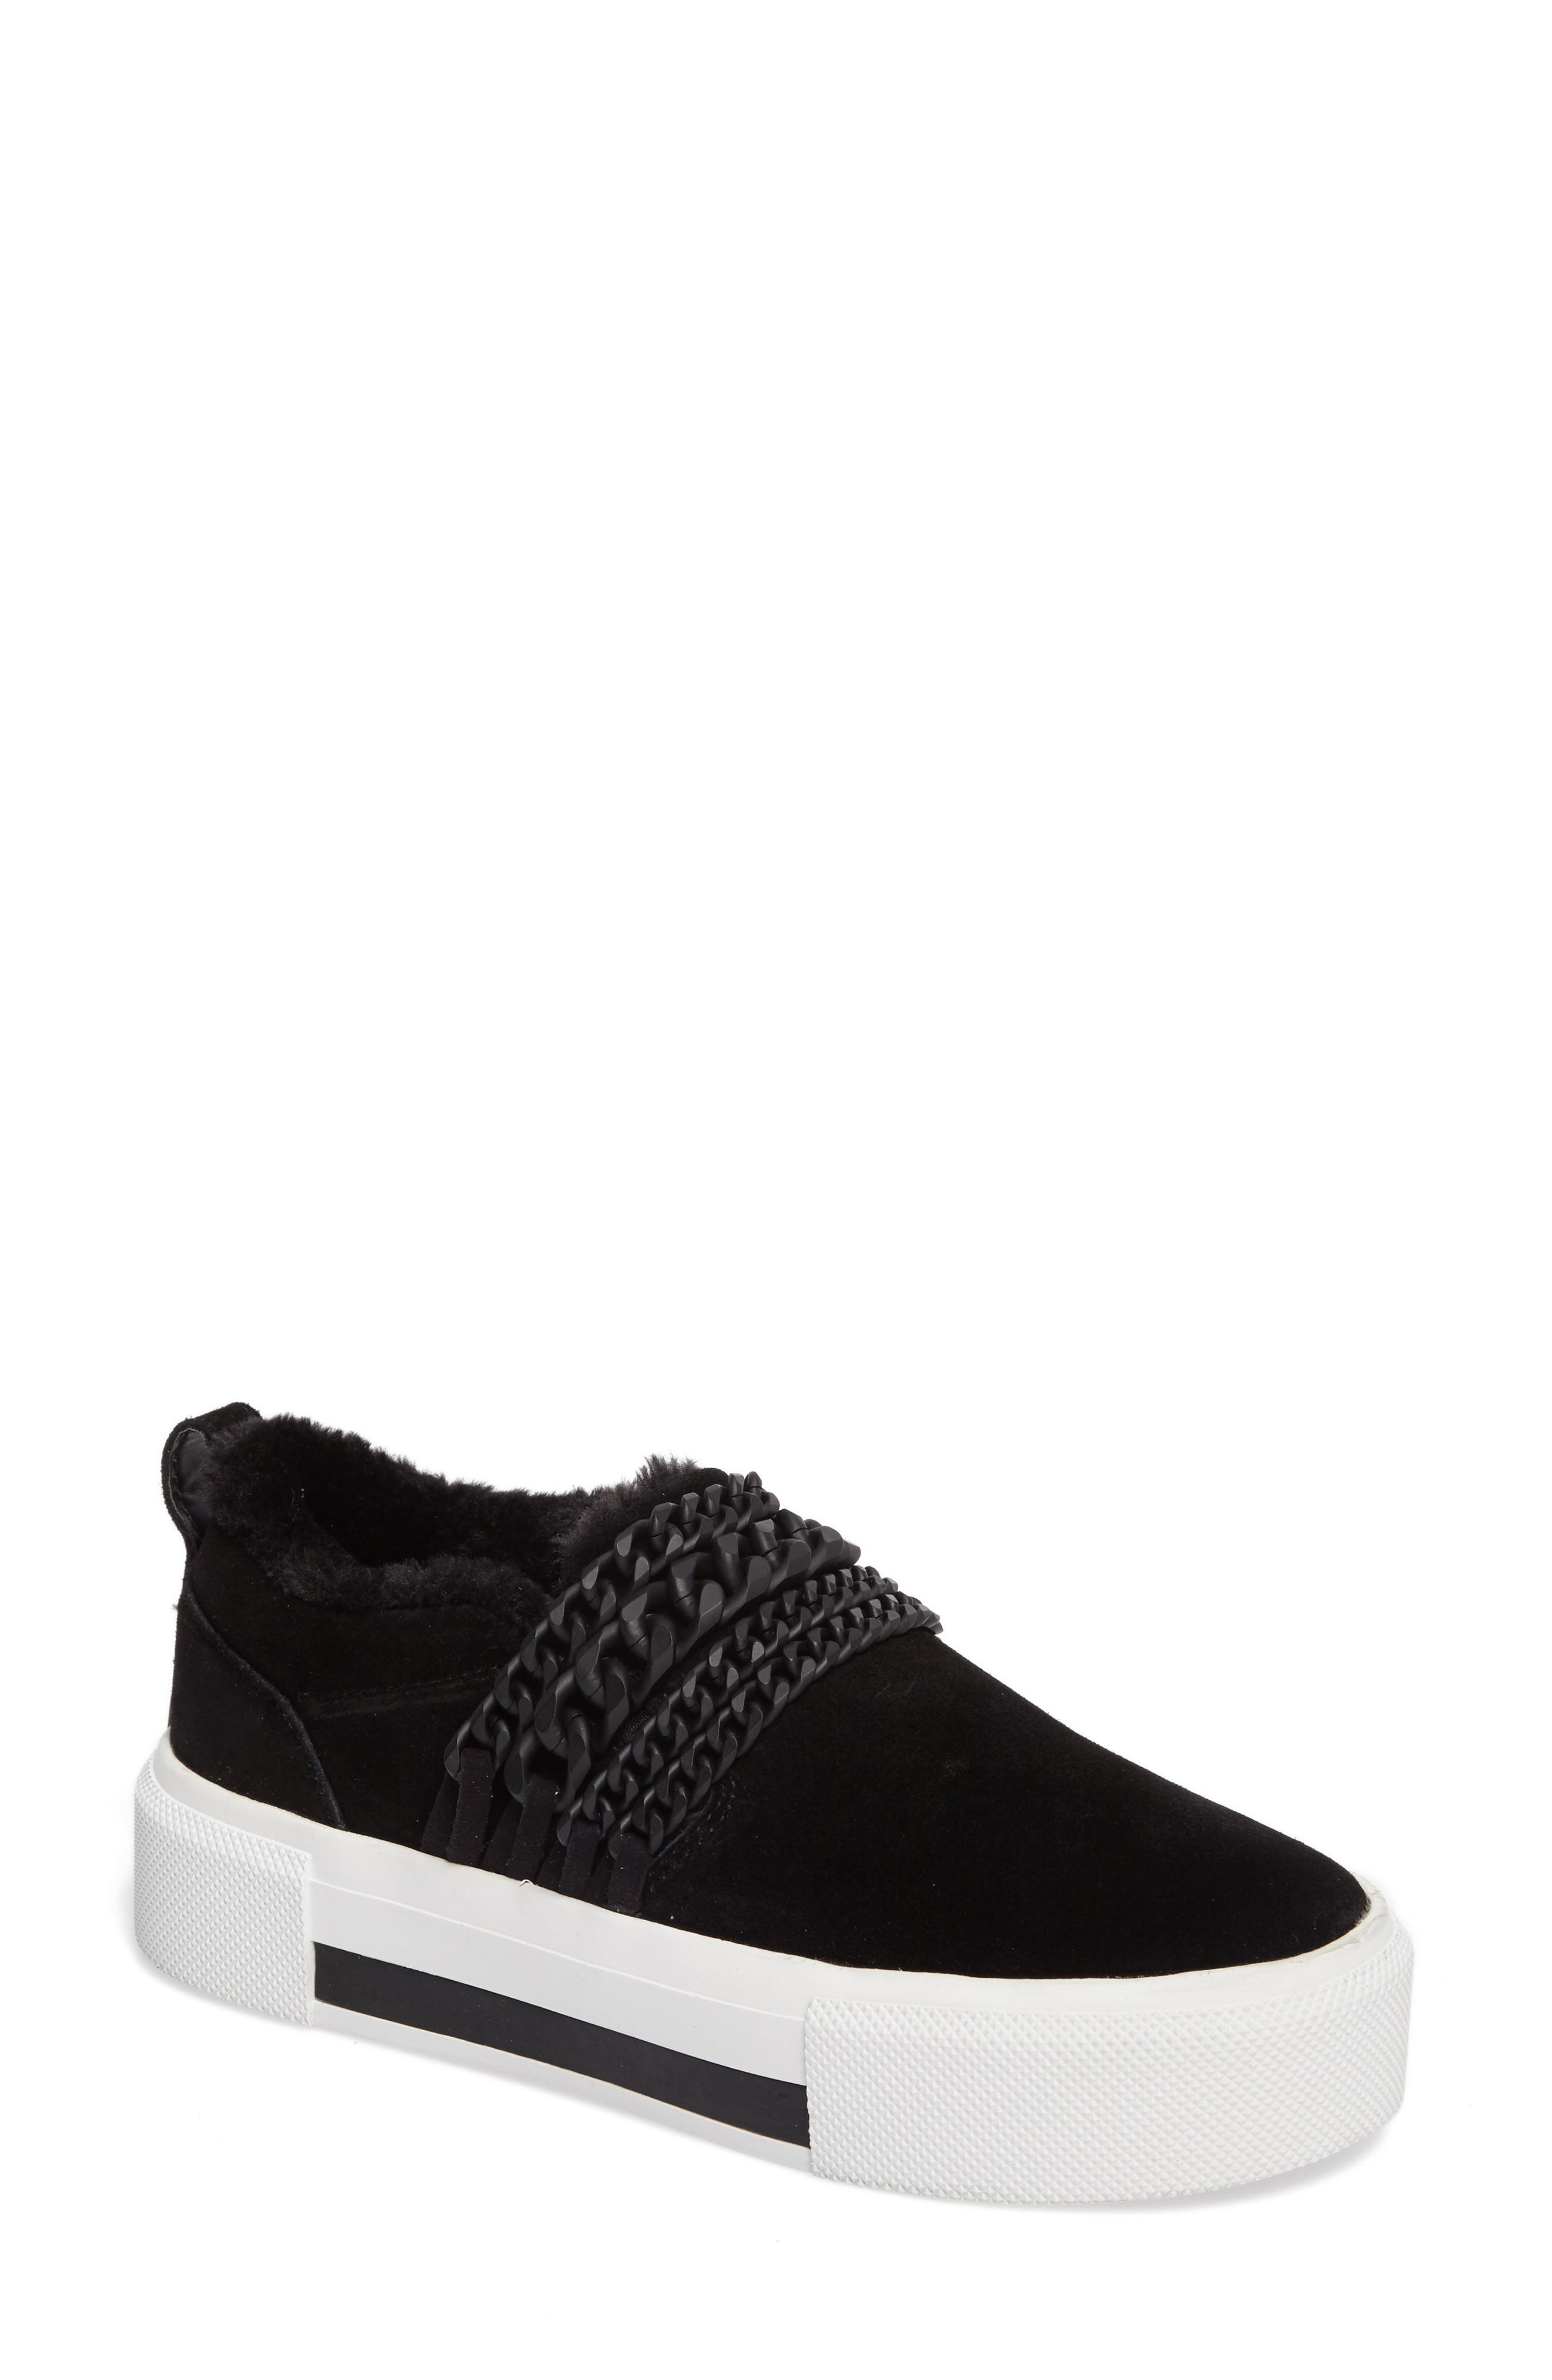 Tory Platform Sneaker,                             Main thumbnail 1, color,                             Black